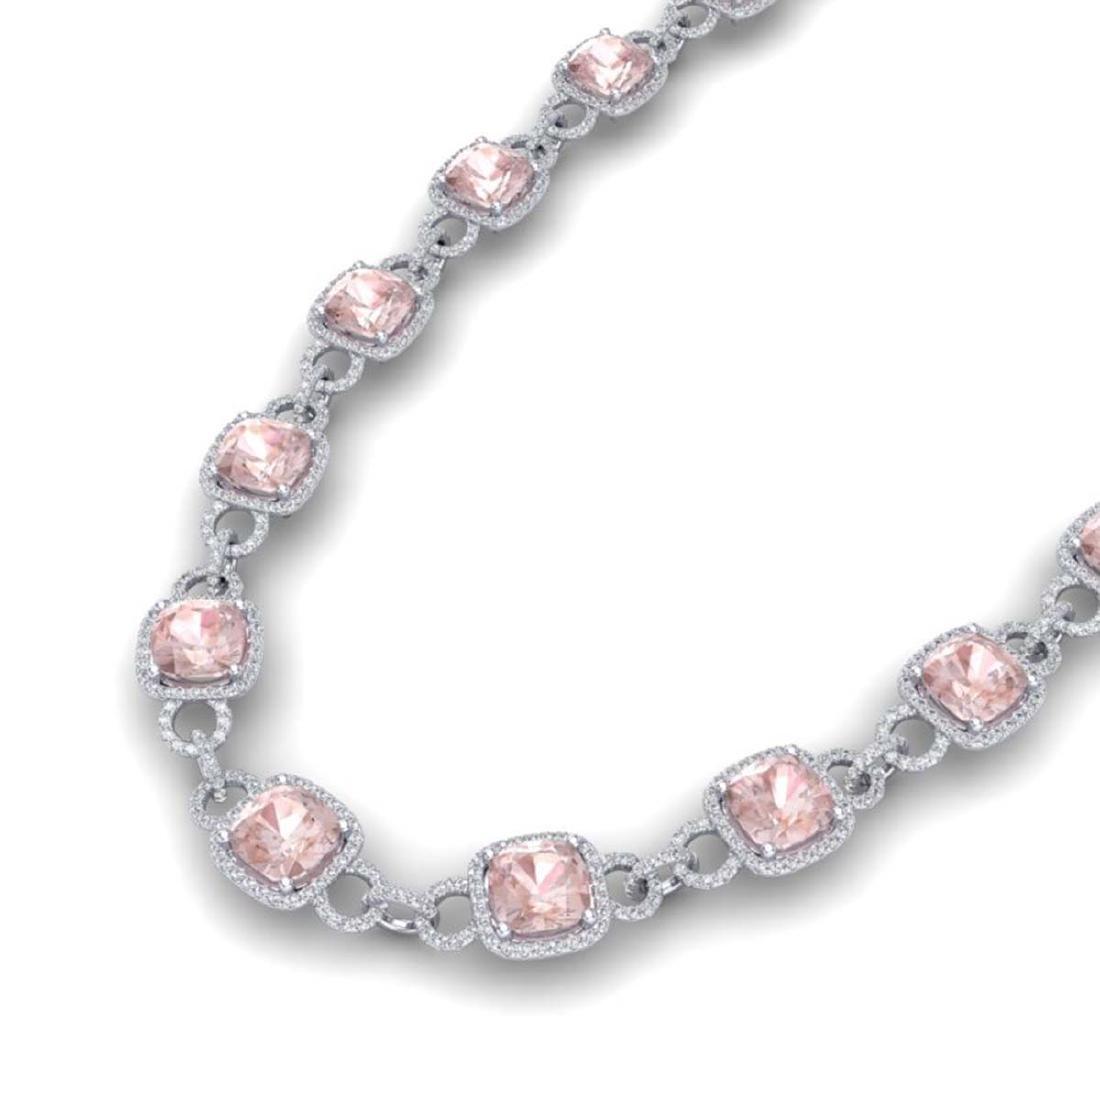 49 ctw Morganite & VS/SI Diamond Necklace 14K White